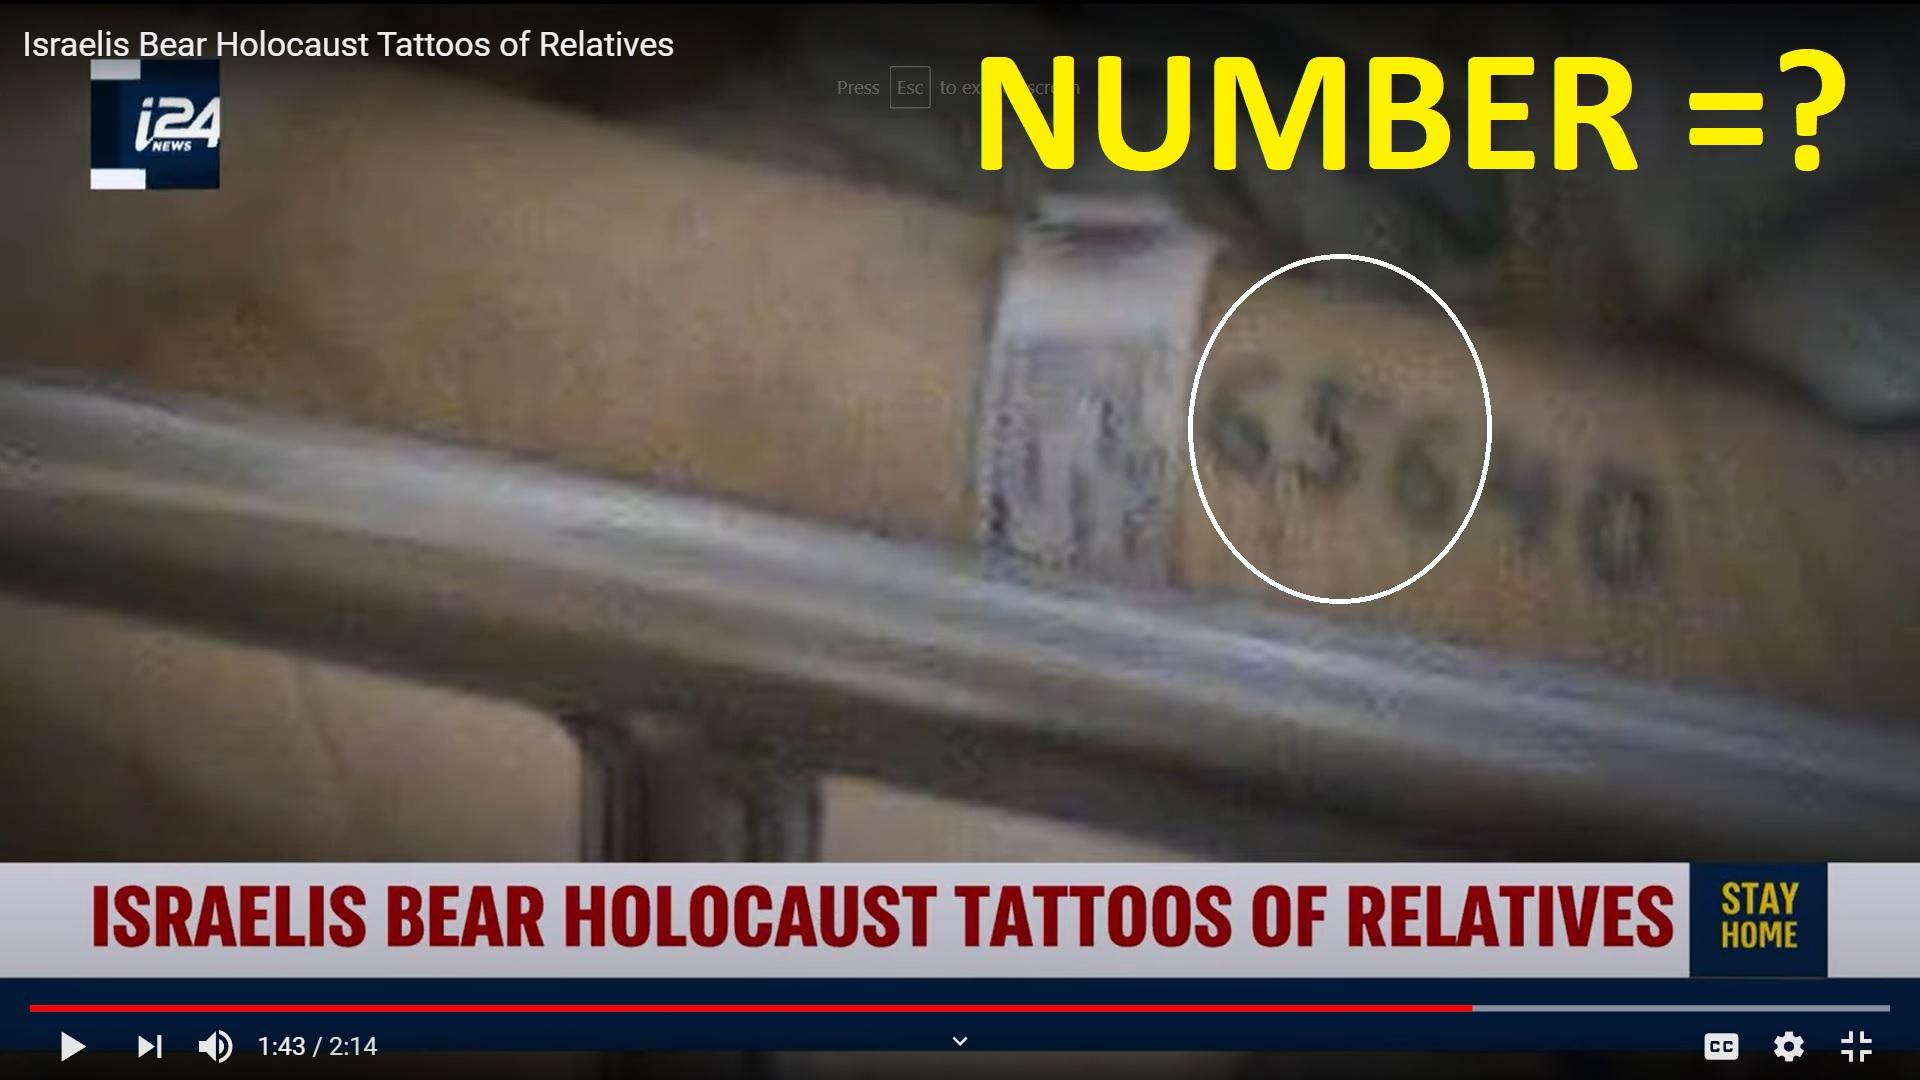 JEWISH HOLOCAUST NUMBERS